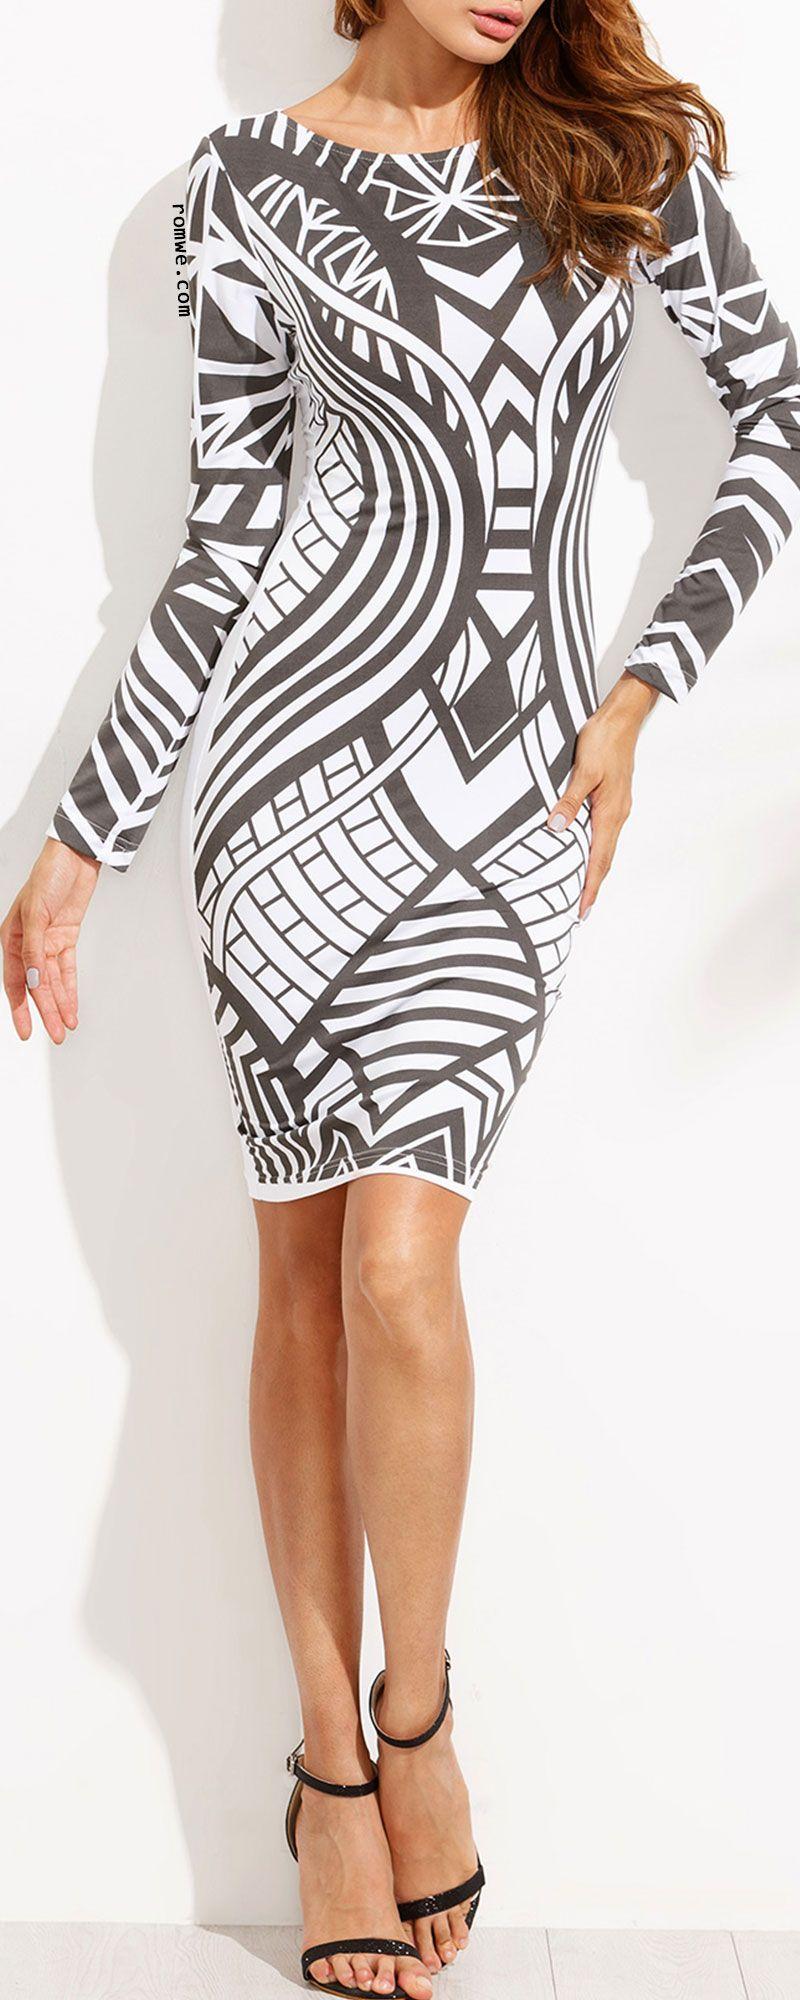 Contrast Print Long Sleeve Bodycon Dress